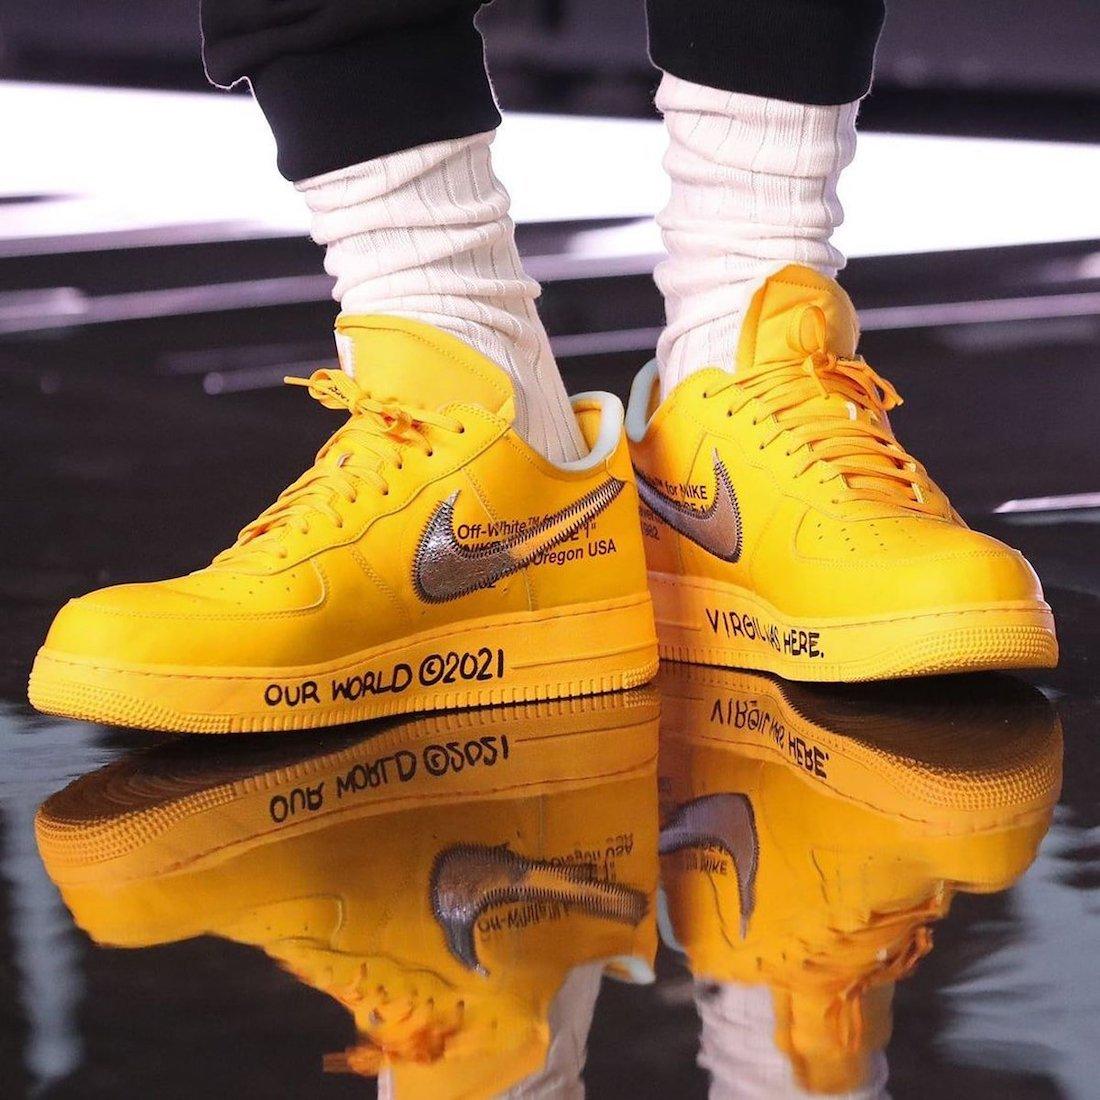 OFF-WHITE,Nike,Air Force 1 Low  又一款鞋圈海景房?OW x Nike「艺术馆联名」本月发售!